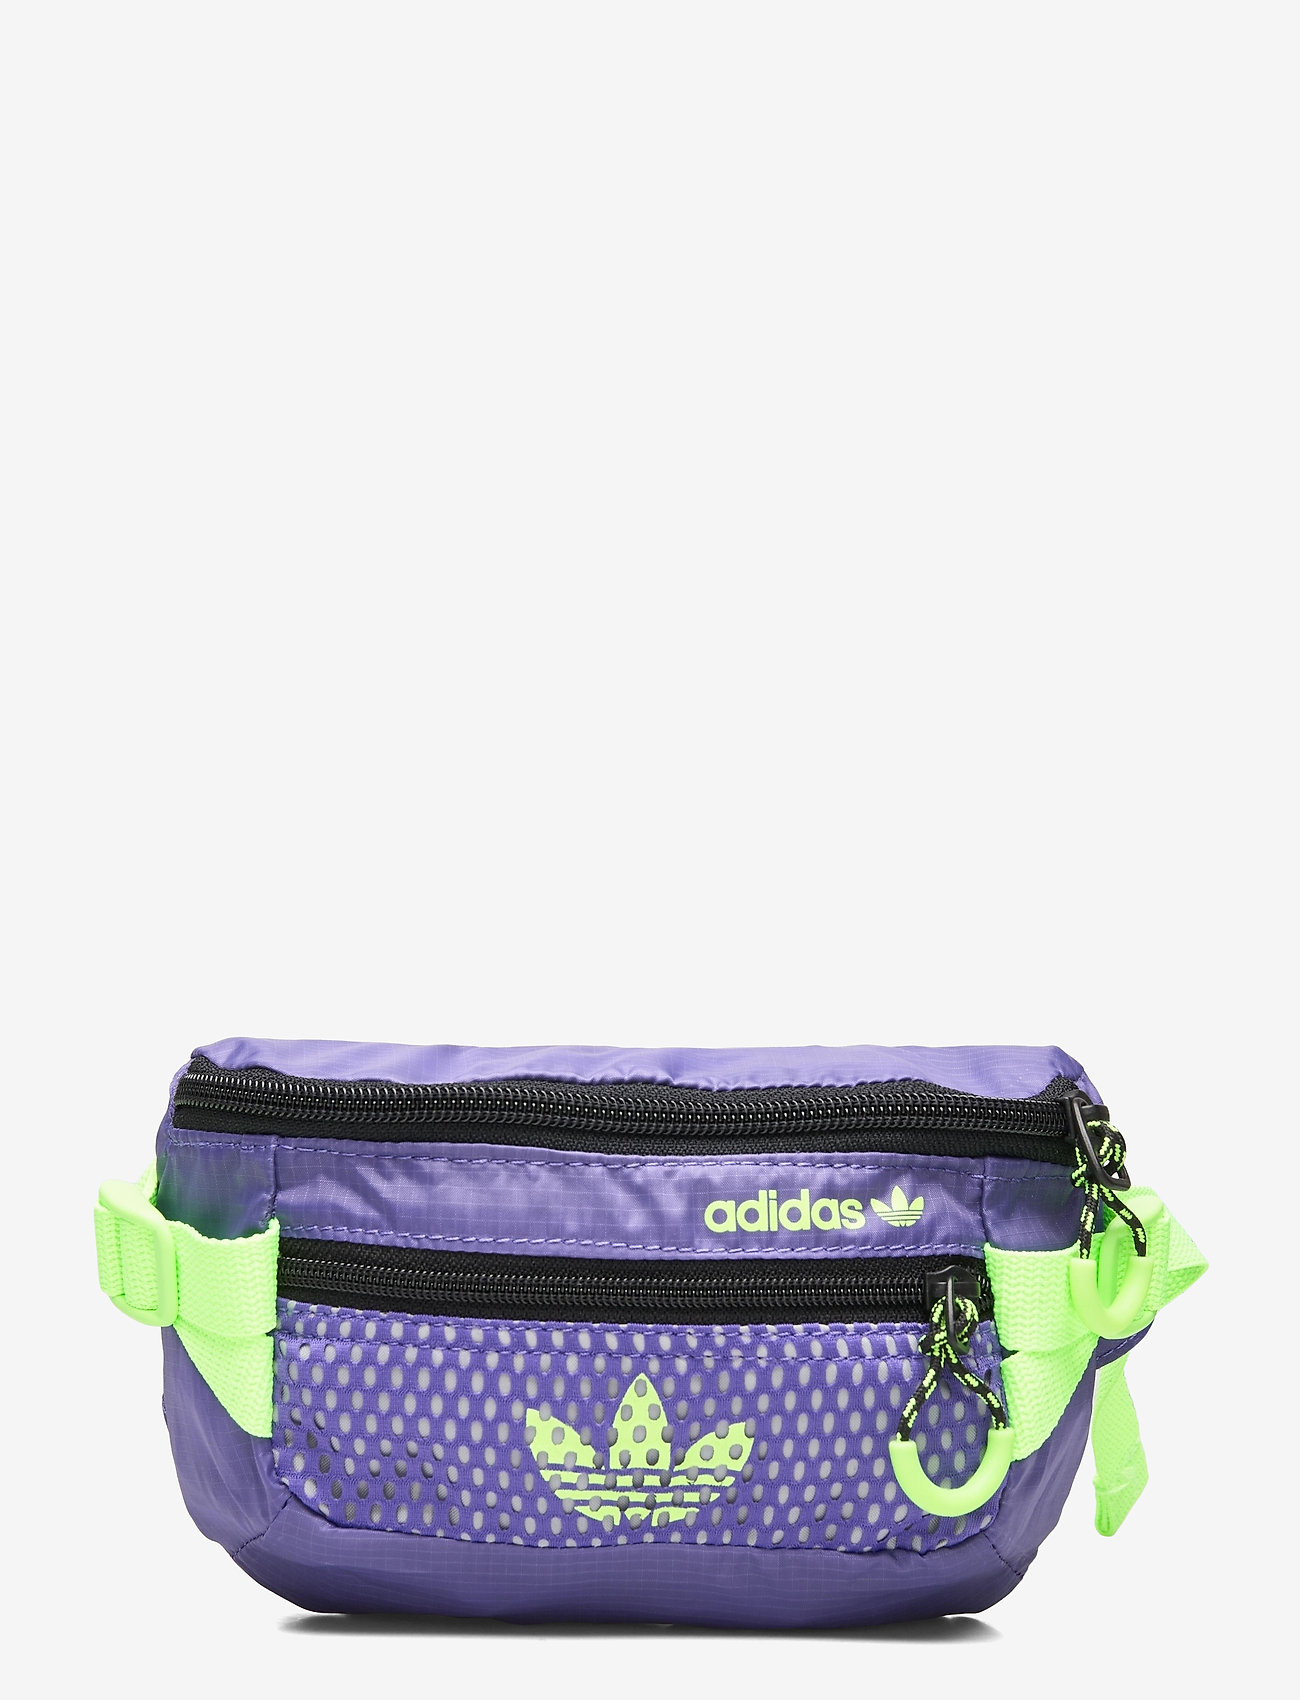 adidas Originals - ADV WAISTBAG S - vyölaukut - purple/black/siggnr - 0